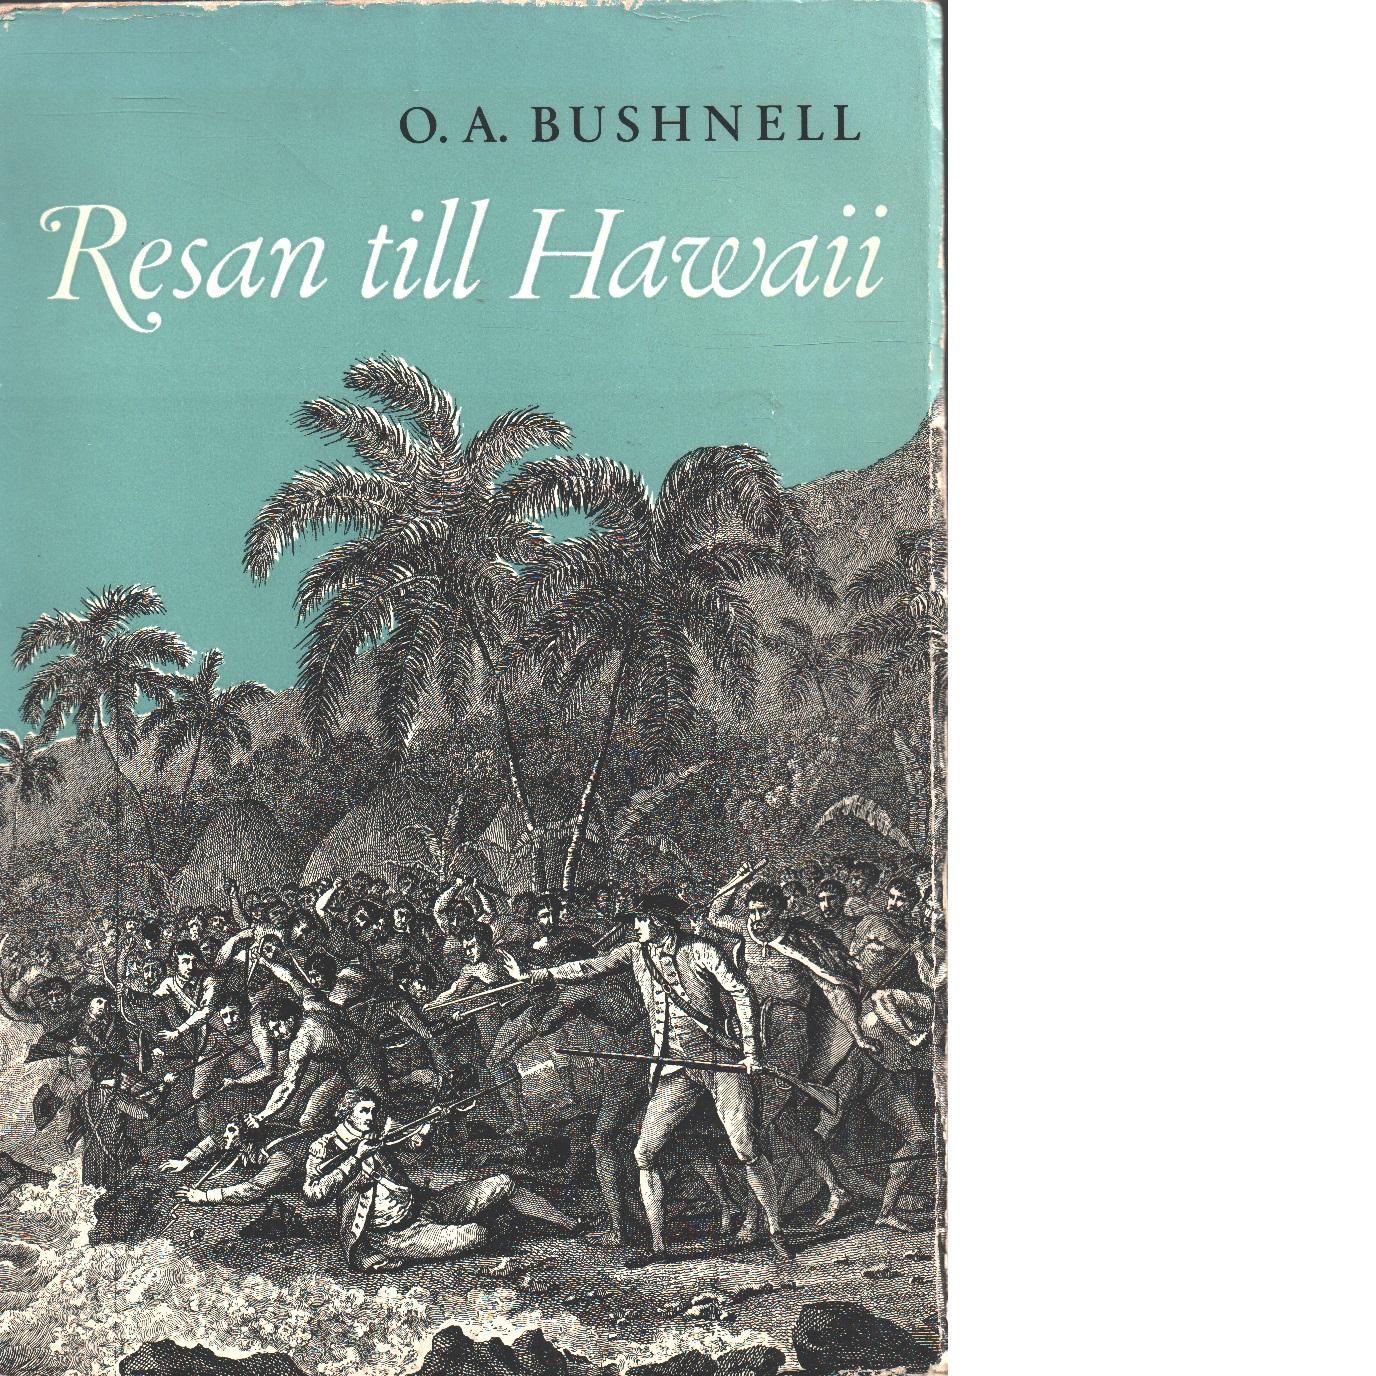 Resan till Hawaii : kapten Cooks sista äventyr - Bushnell, Oswald Andrew